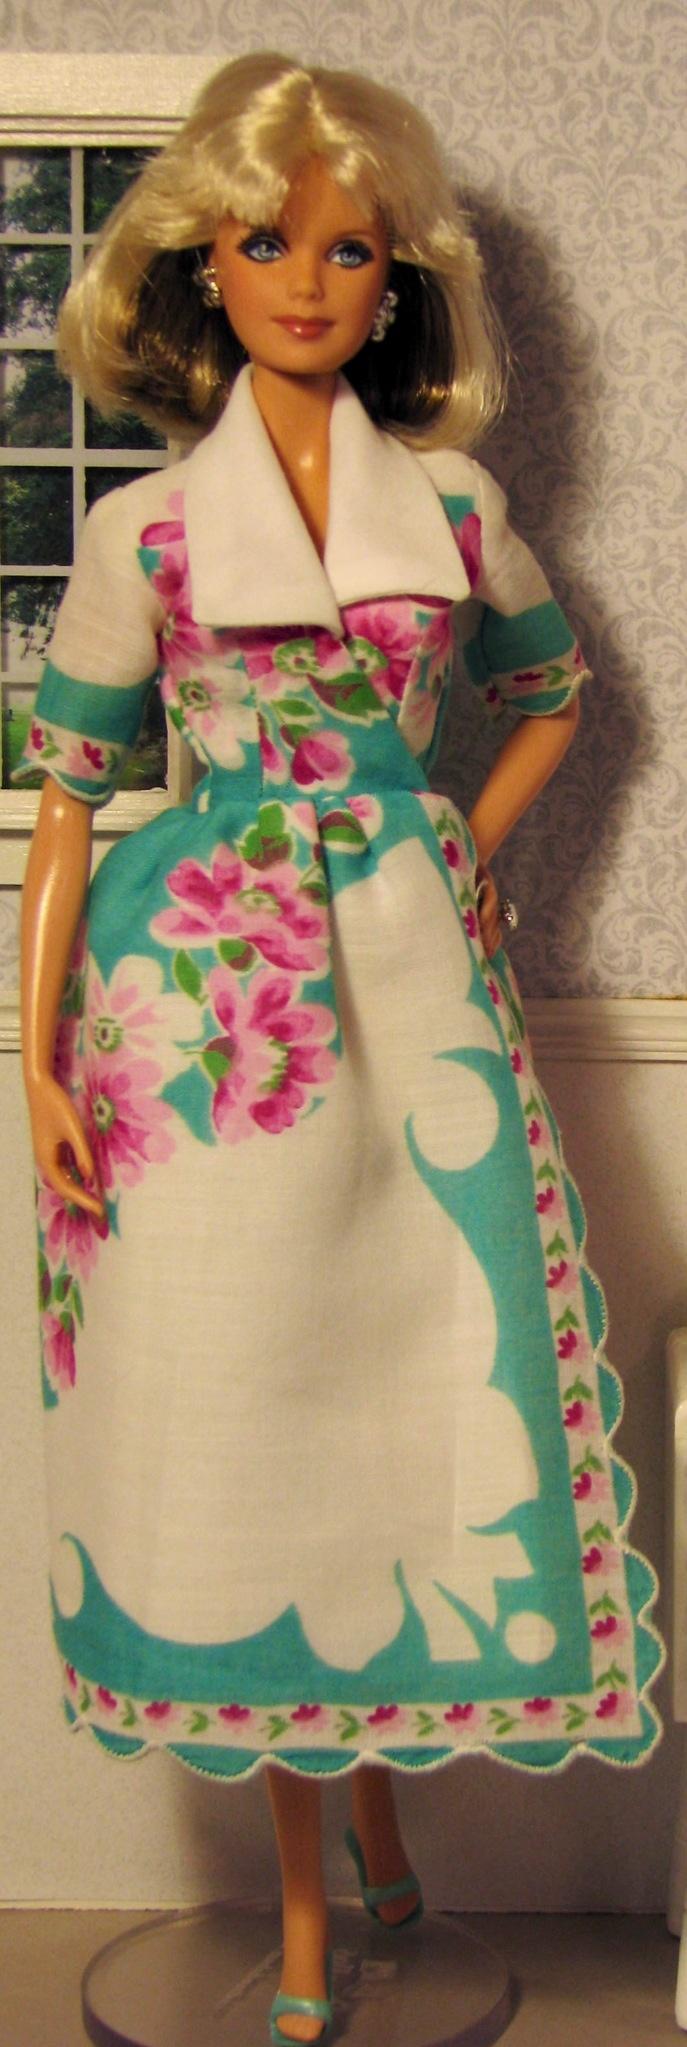 Wrap Barbie dress made from vintage hankie